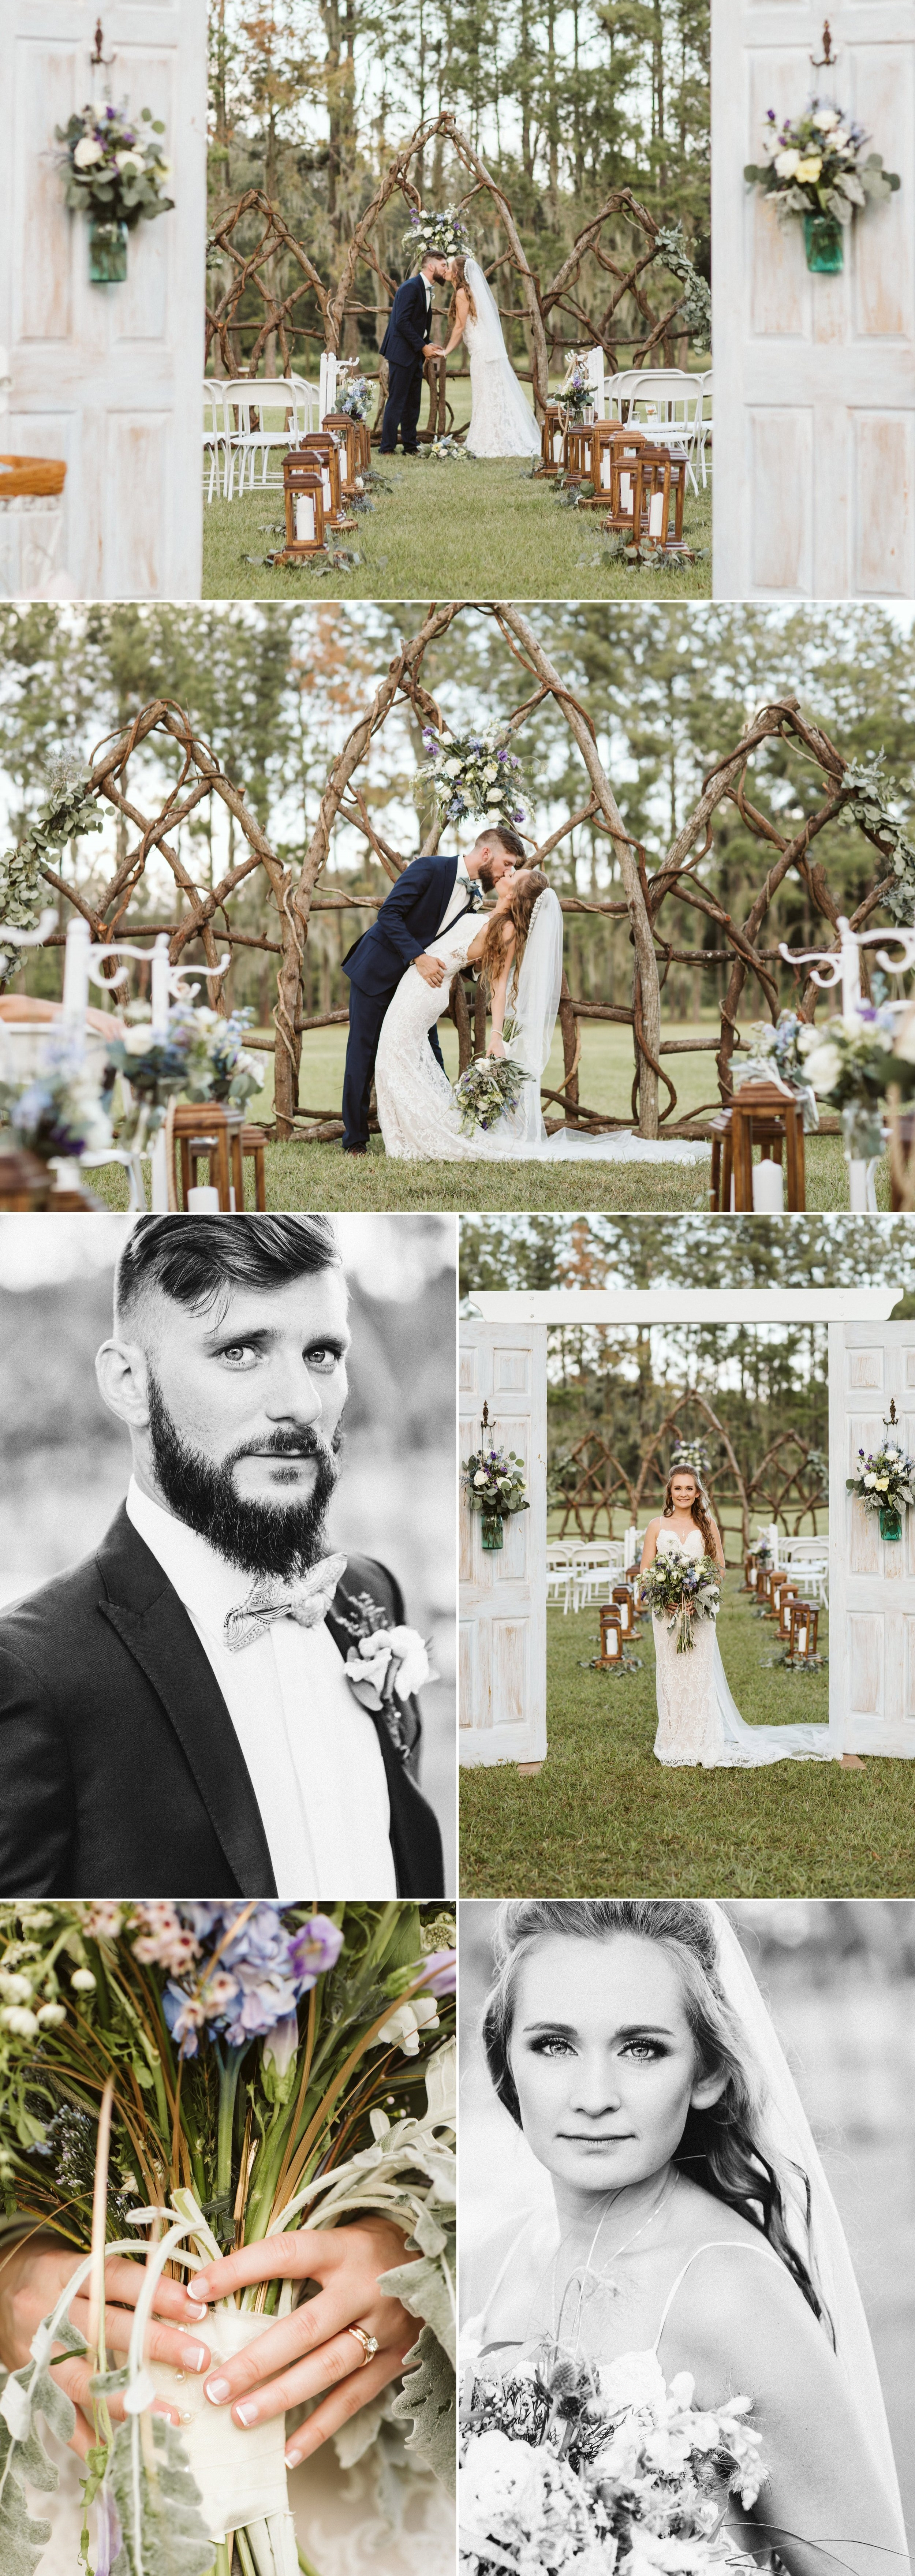 Romantic Floral Outdoor Field Chapel Wedding- Sarasota Florida- Courtney & Isaac20.jpg